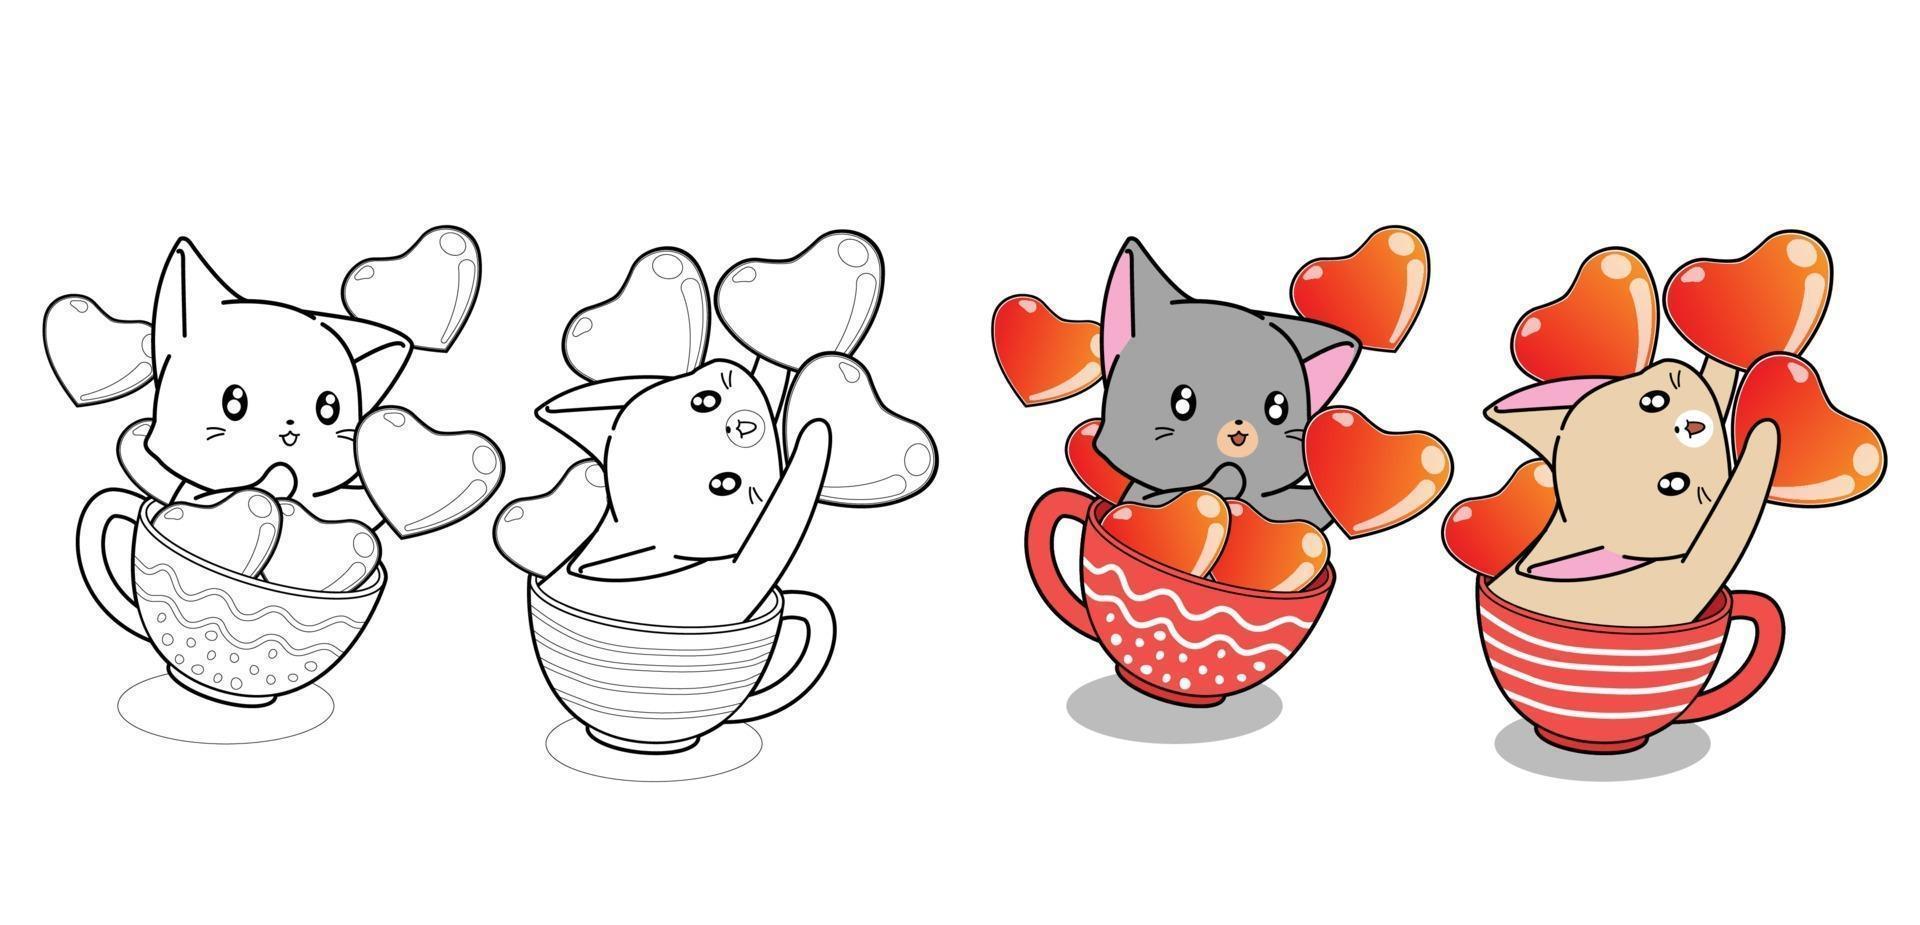 página para colorir dos desenhos animados do casal bonito na xícara de café vetor